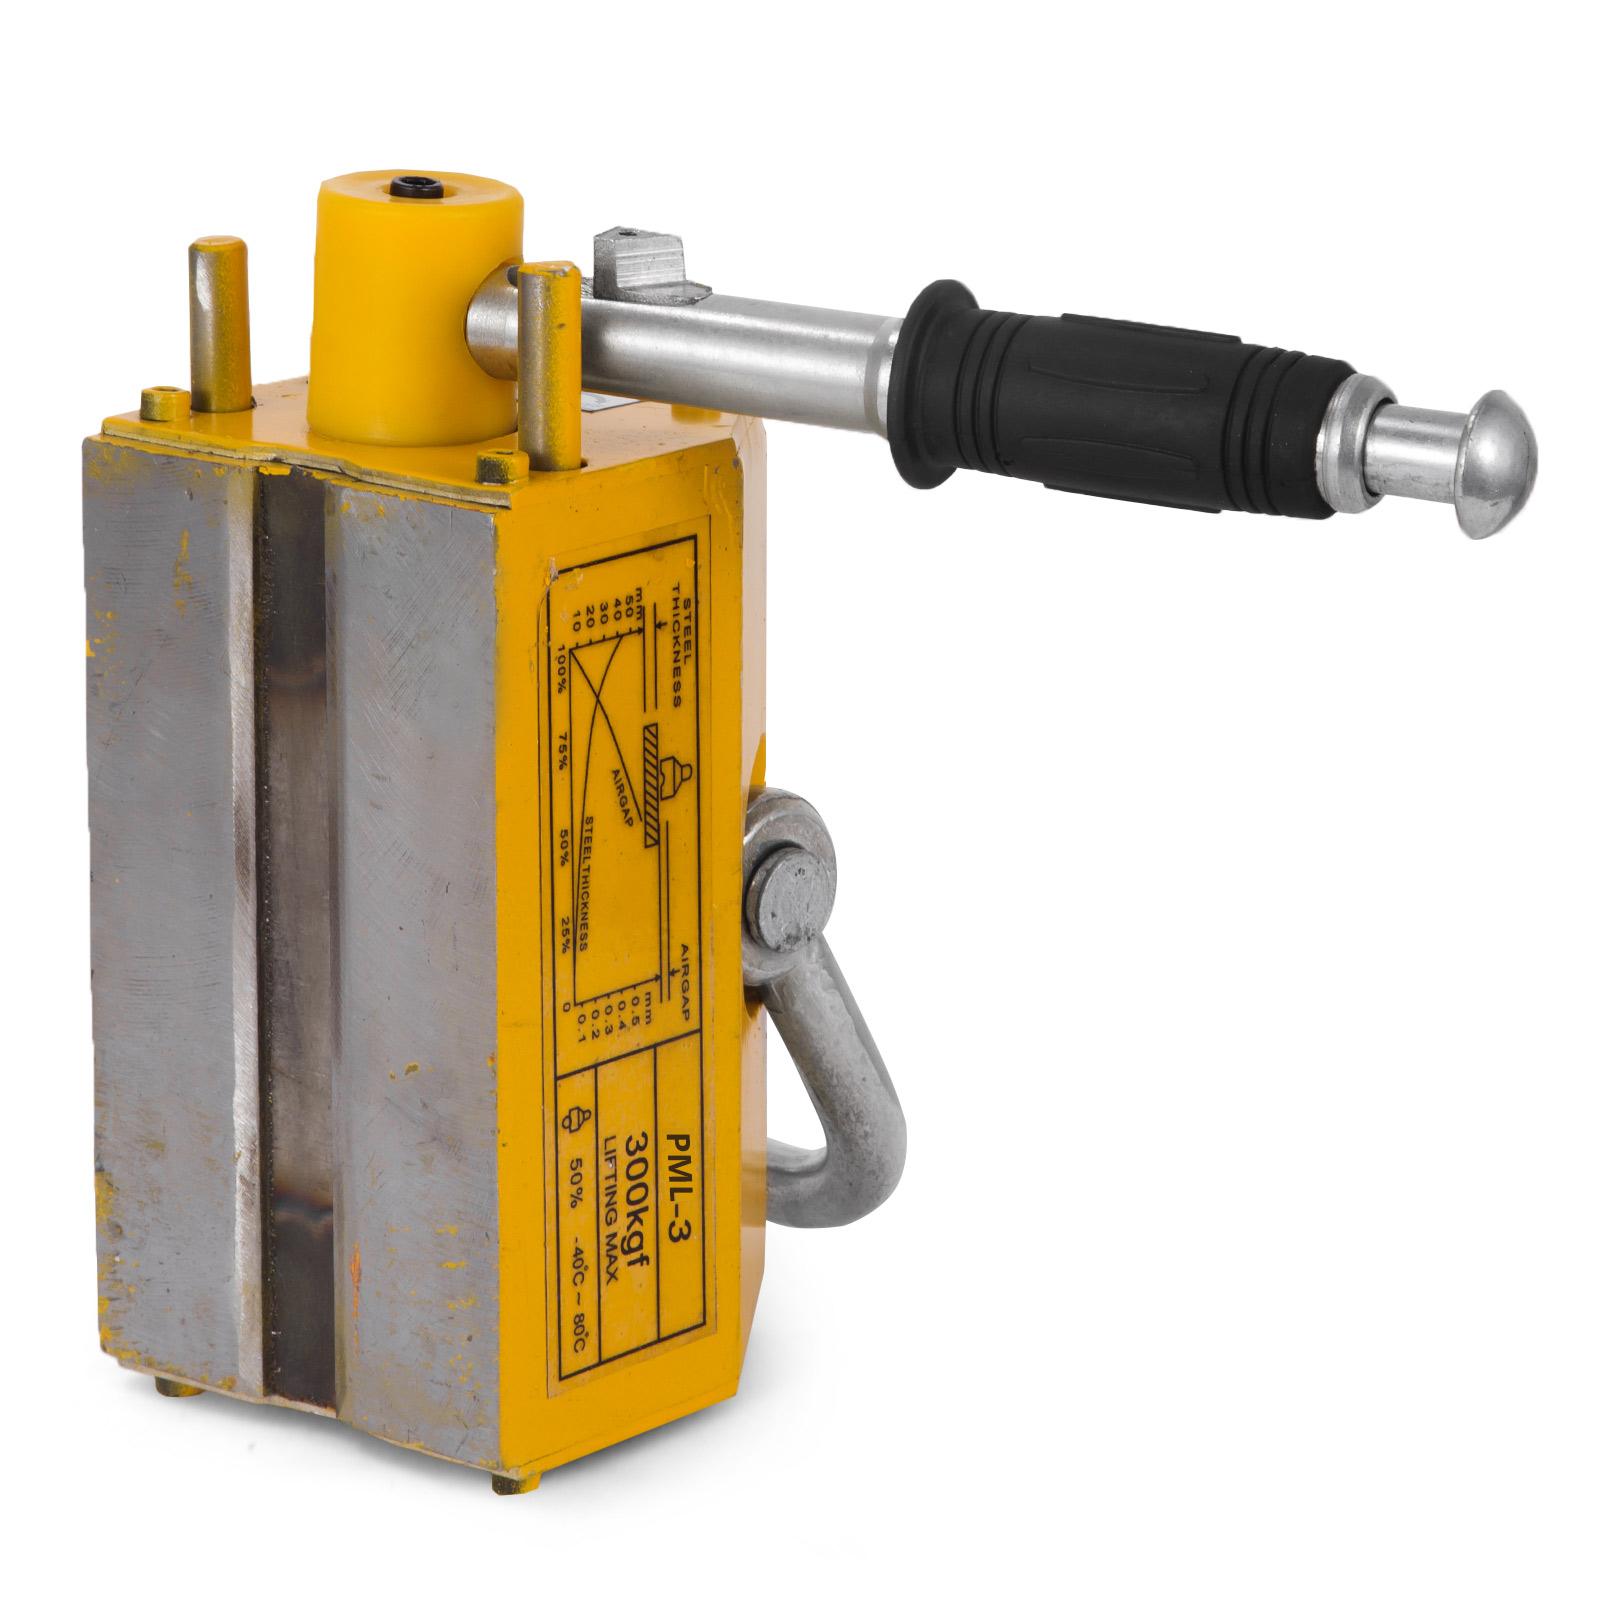 100-300-600-1000KG-Steel-Magnetic-Lifter-Heavy-Duty-Crane-Hoist-Lifting-Magnet miniature 31